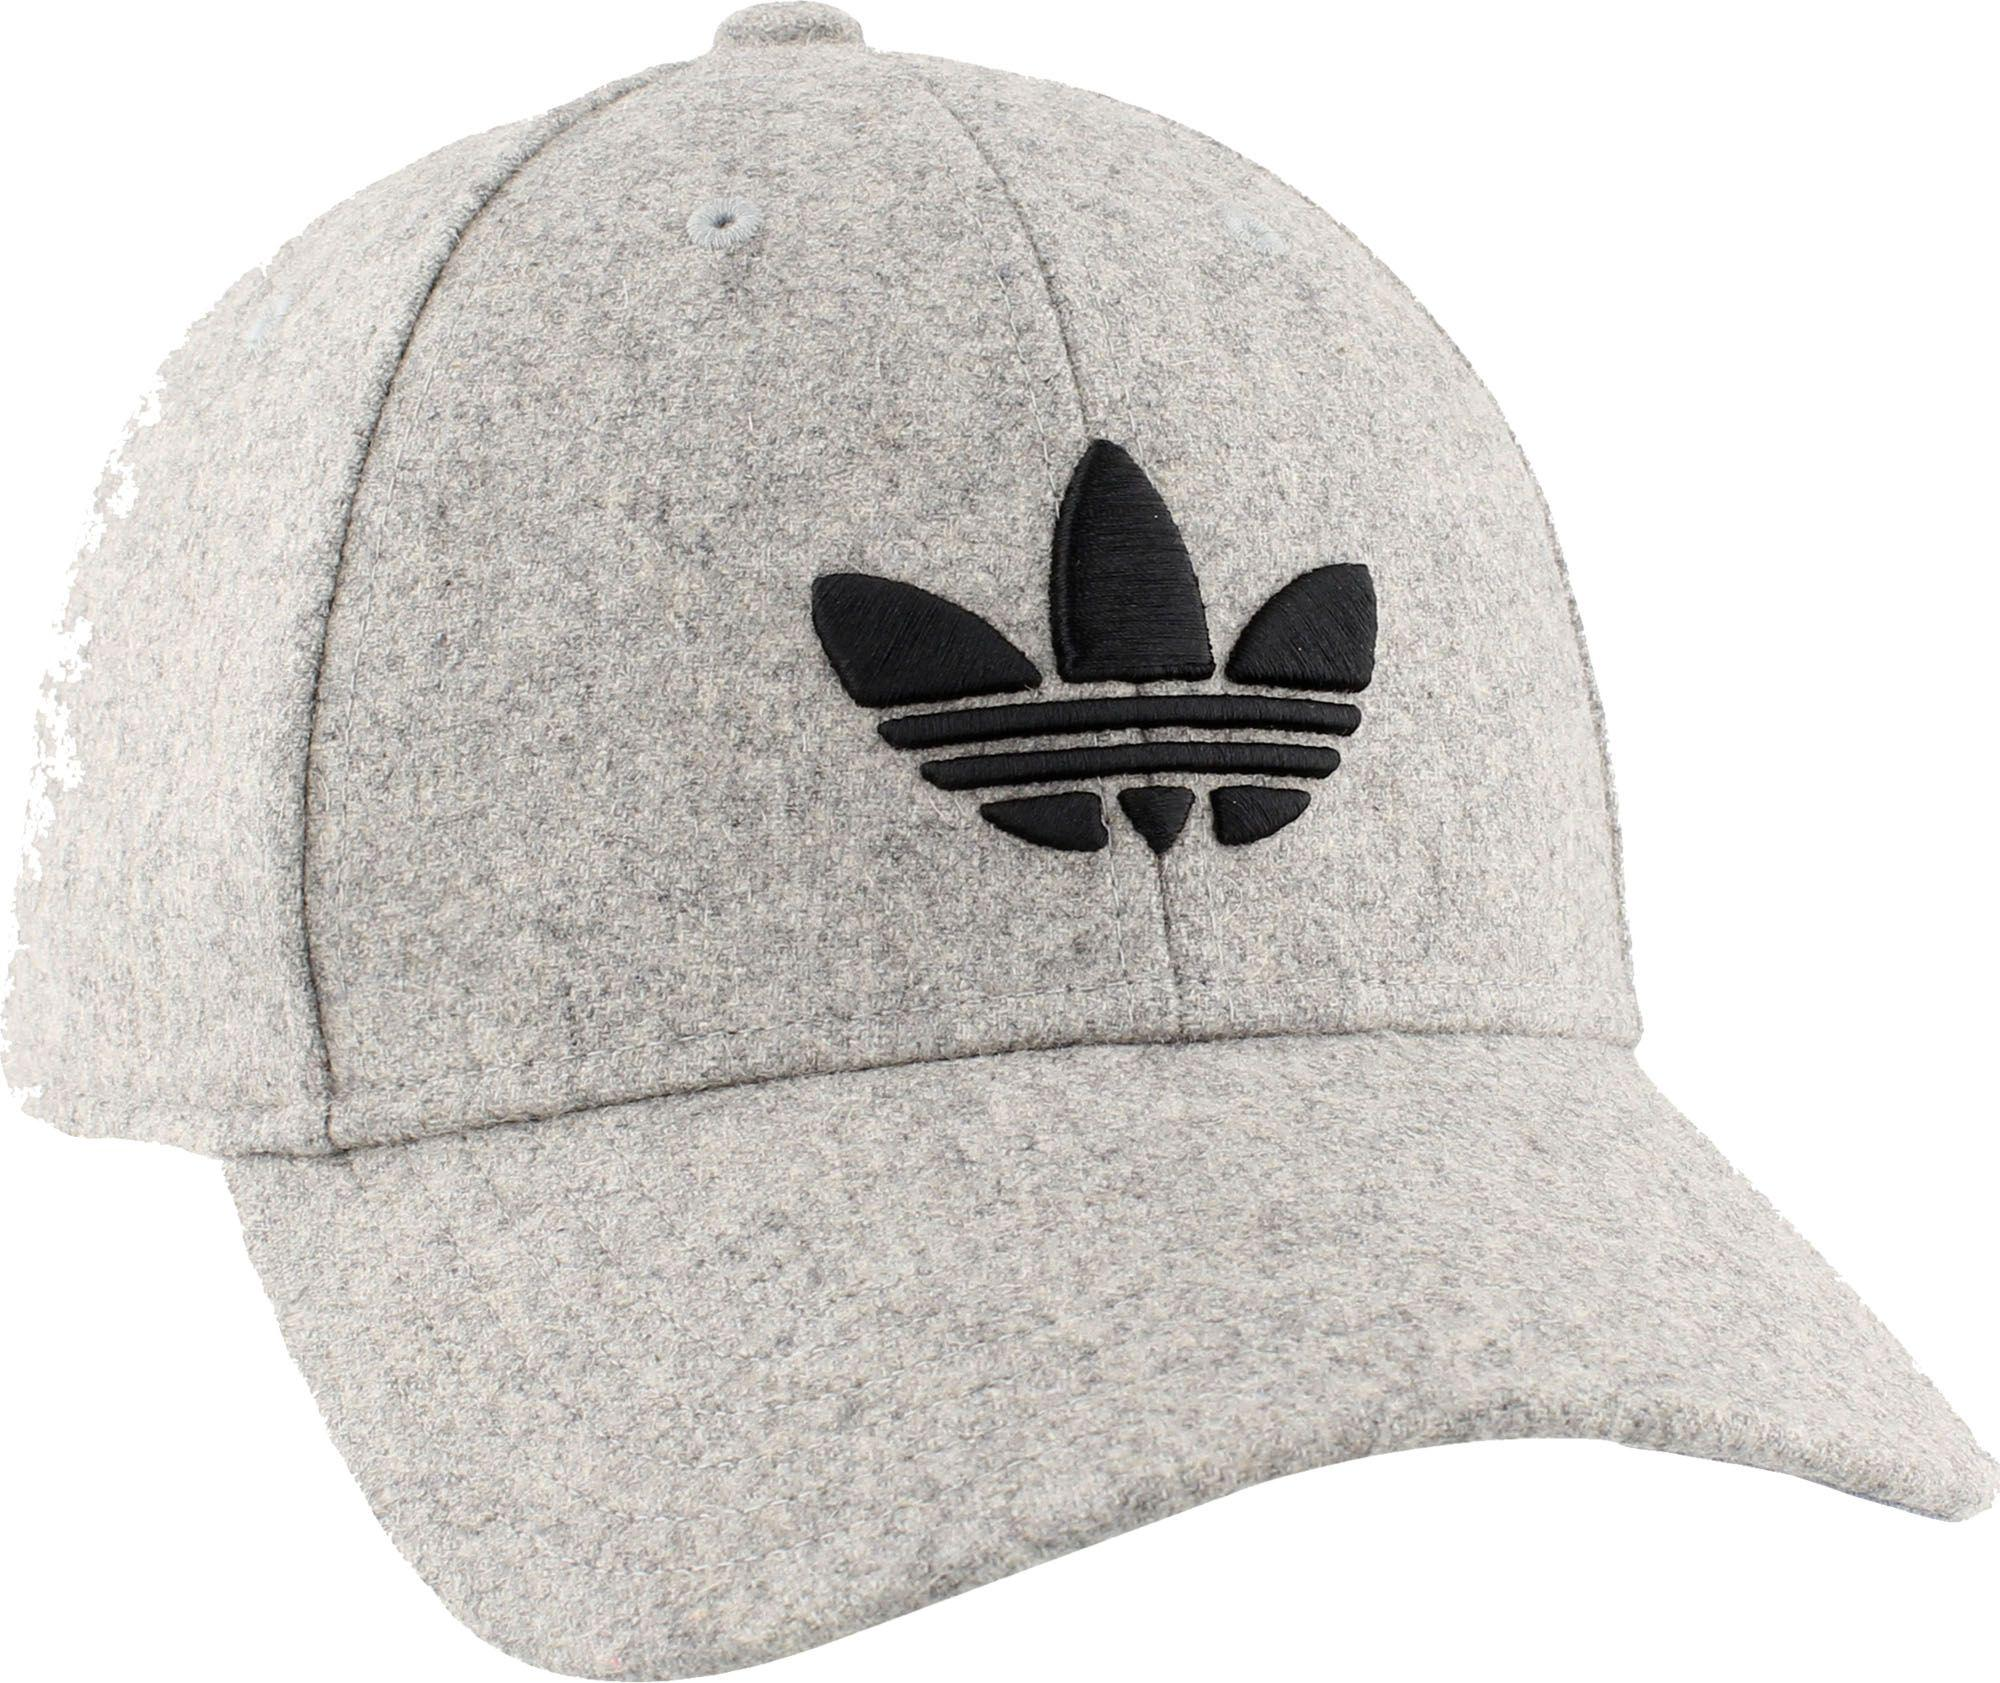 84c0caf7d1d Lyst - adidas Originals Trefoil Plus Precurve Hat in Gray for Men